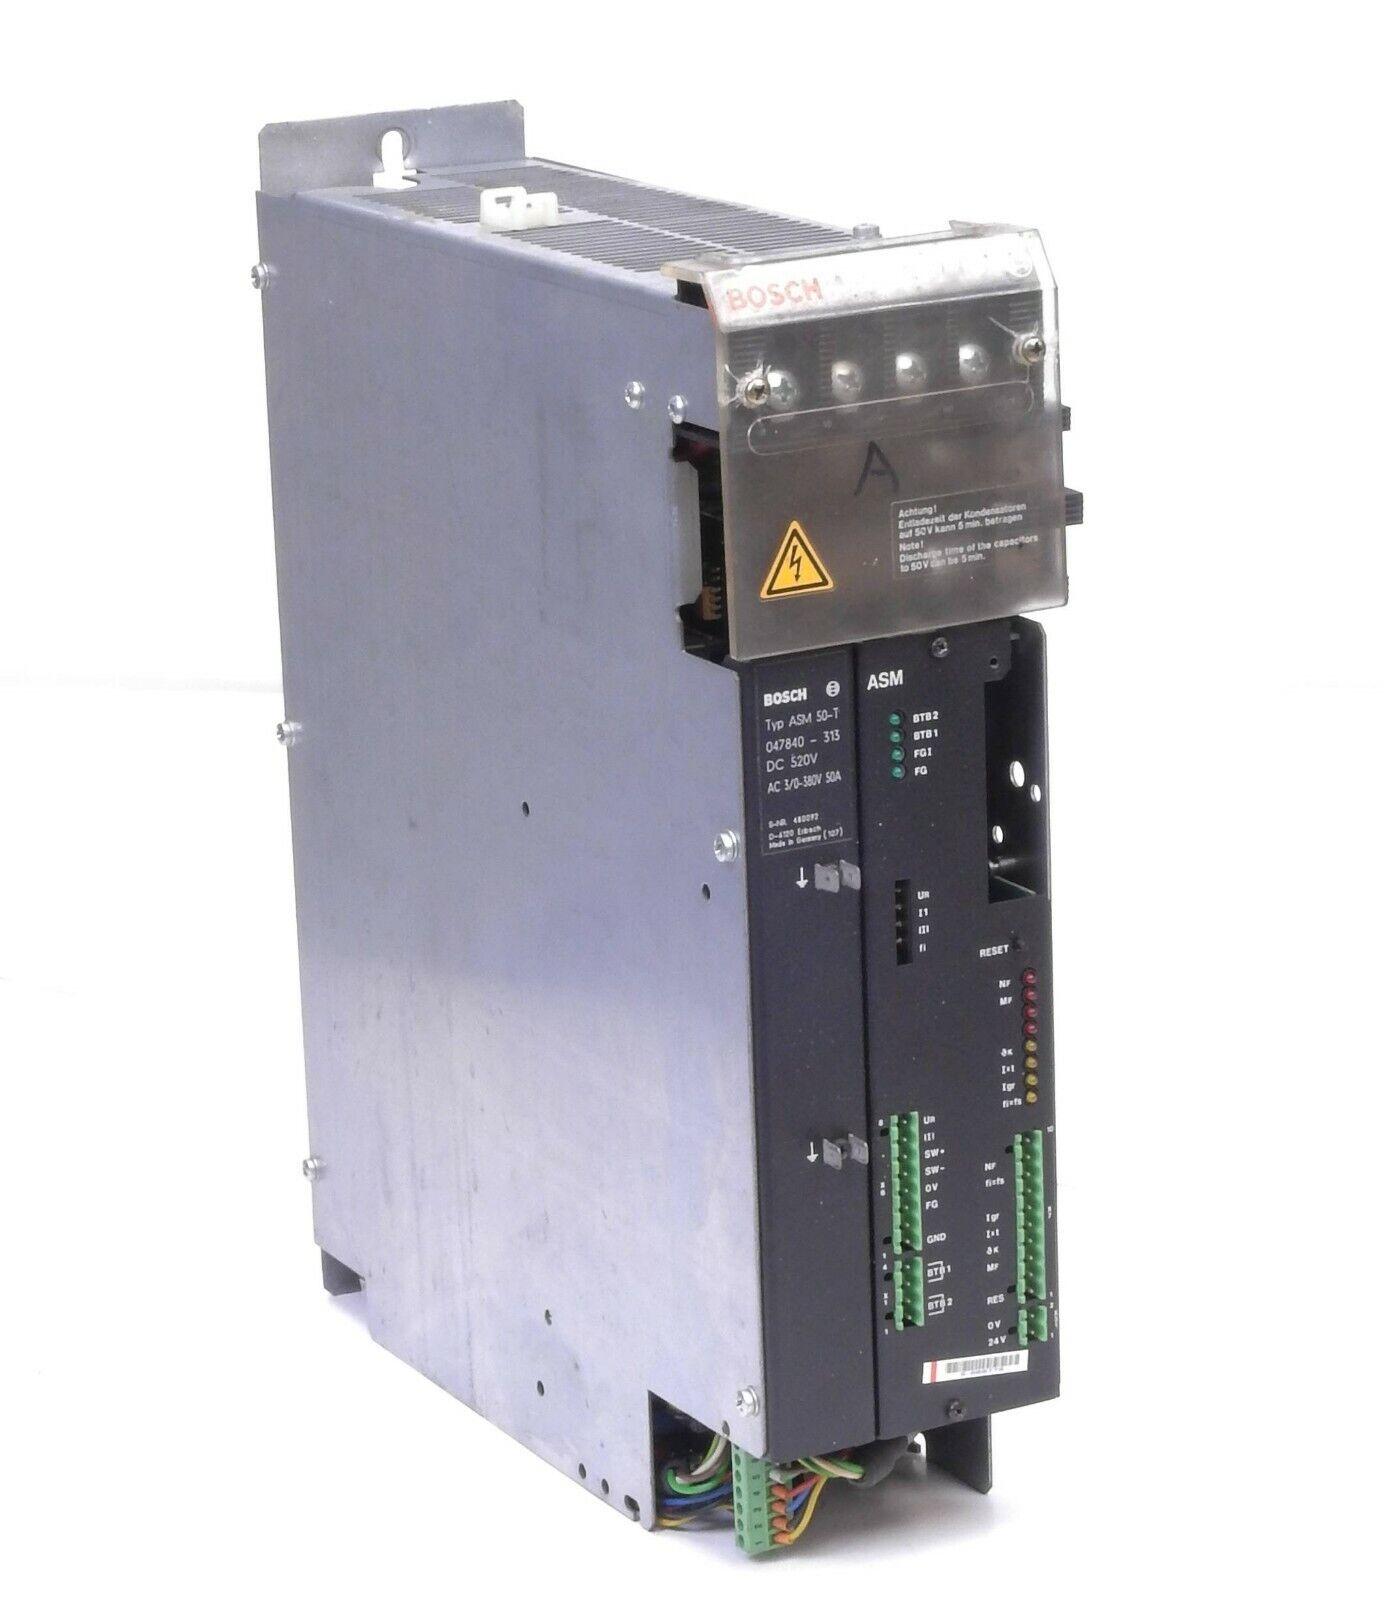 Bosch ASM 50-TA 047840-313